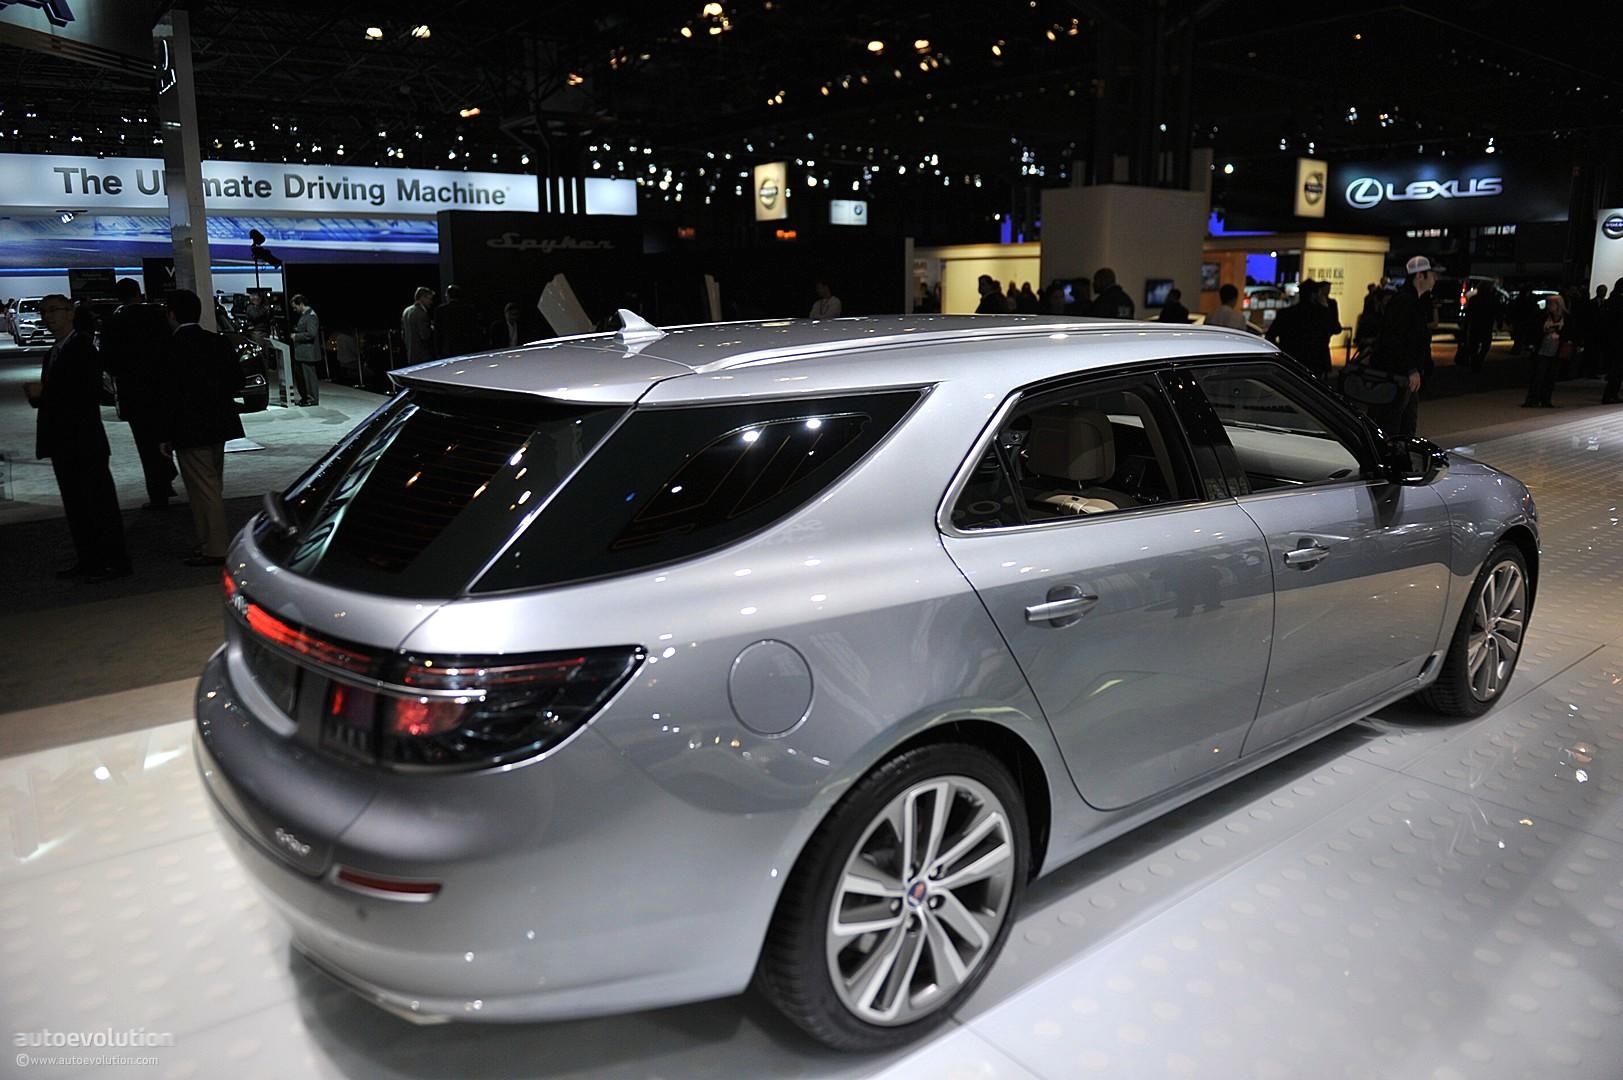 2011 Saab 9 5 Wagon The Towbar Wiring Diagram Sportcombi Photos 8 On Better Parts Ltd